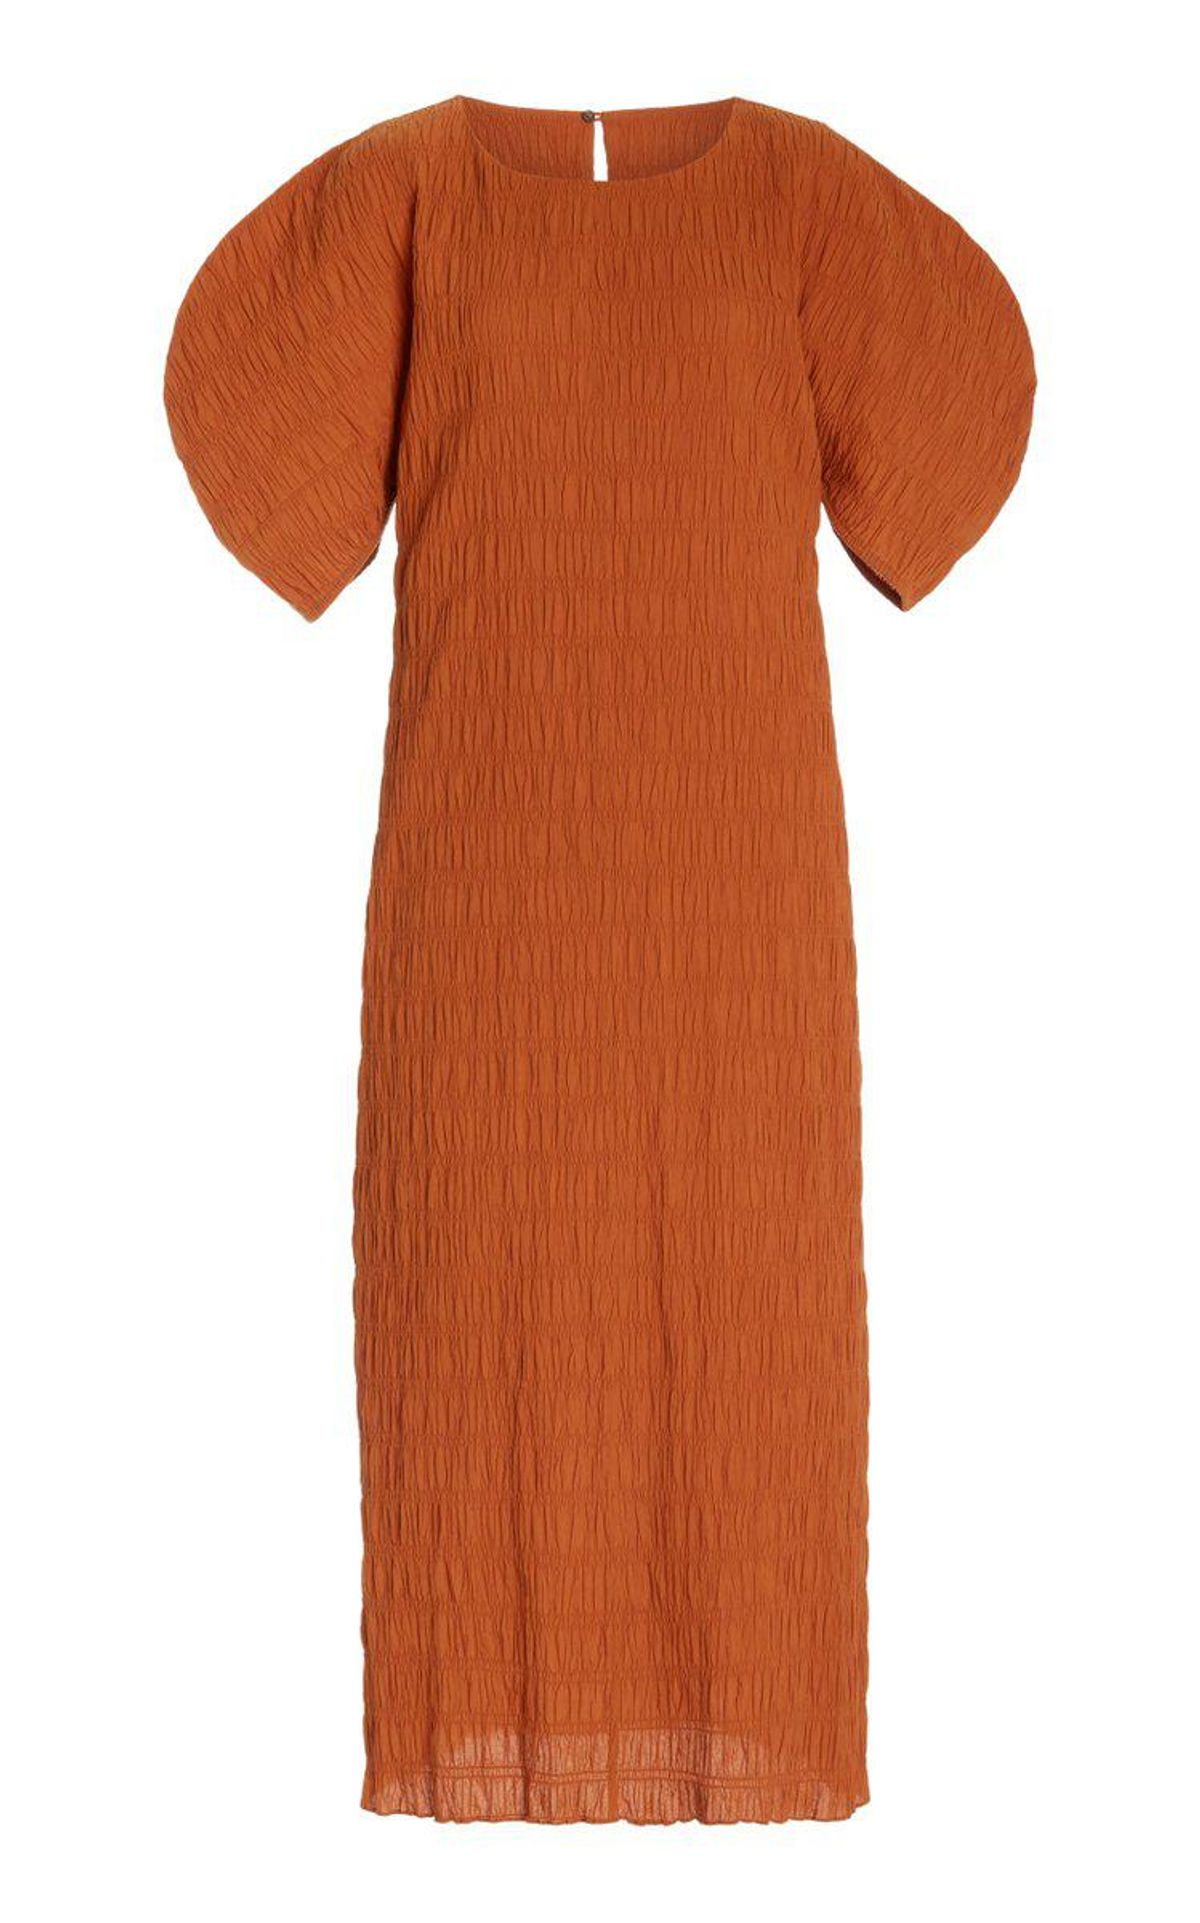 Aranza Organic Cotton Midi Dress